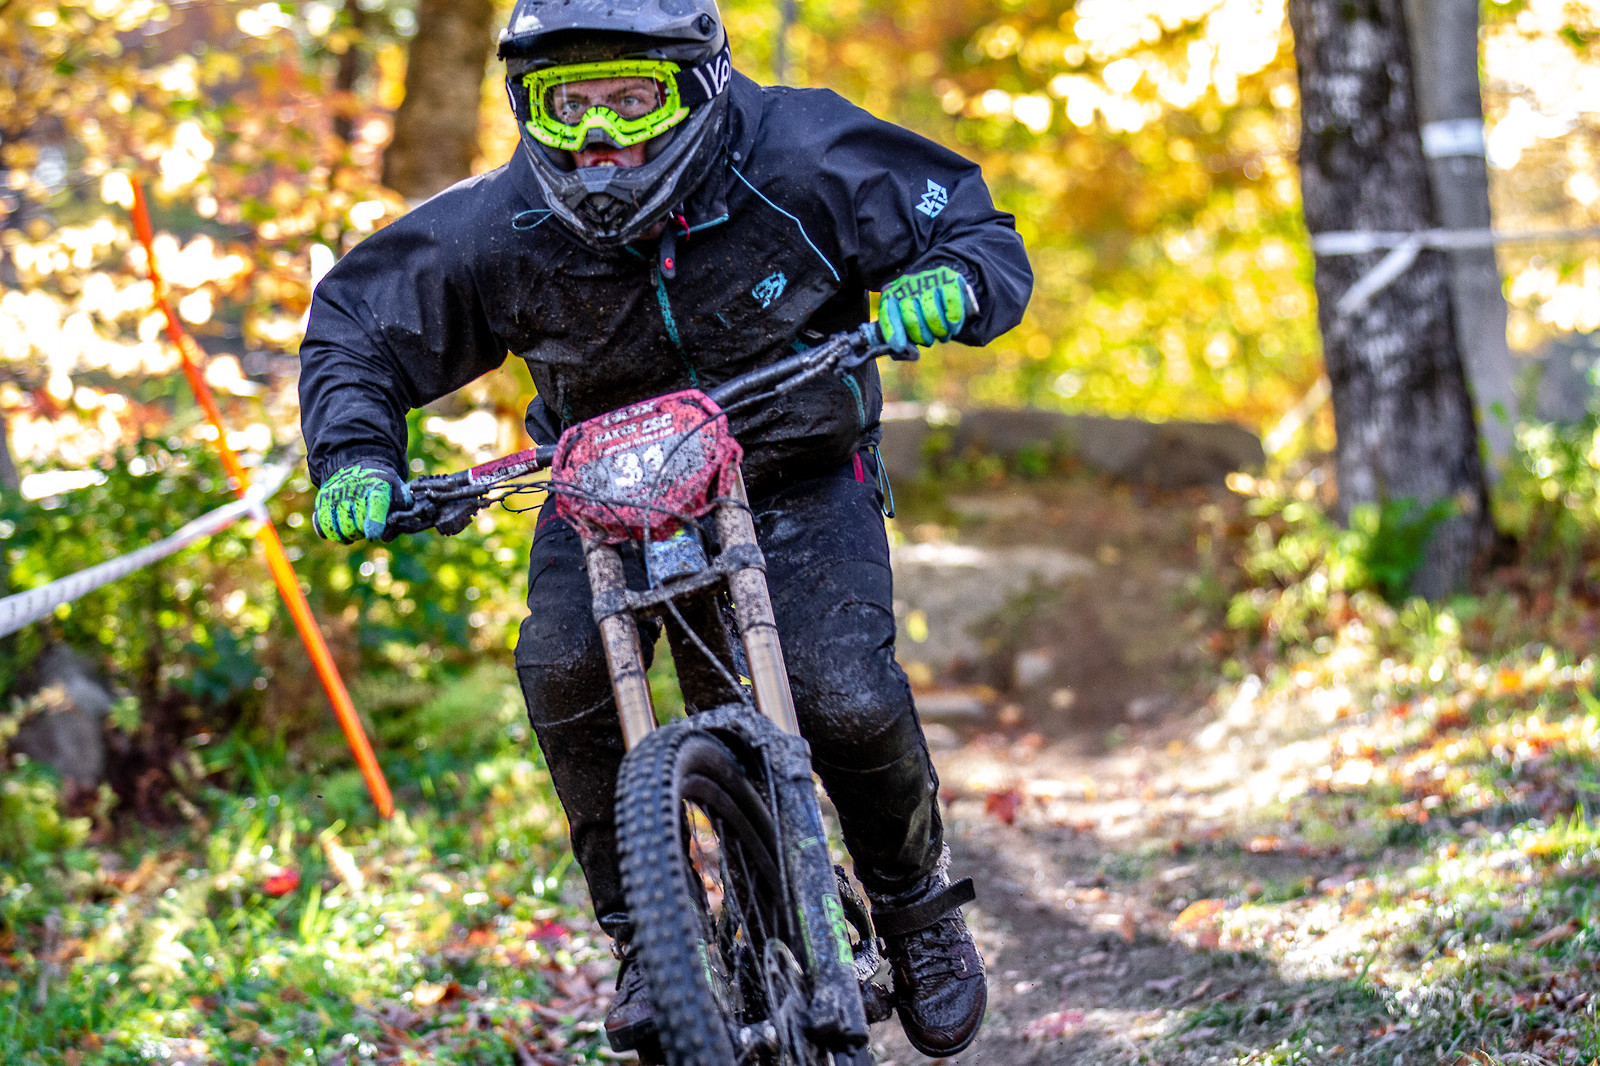 Sean Surprenant - JackRice - Mountain Biking Pictures - Vital MTB